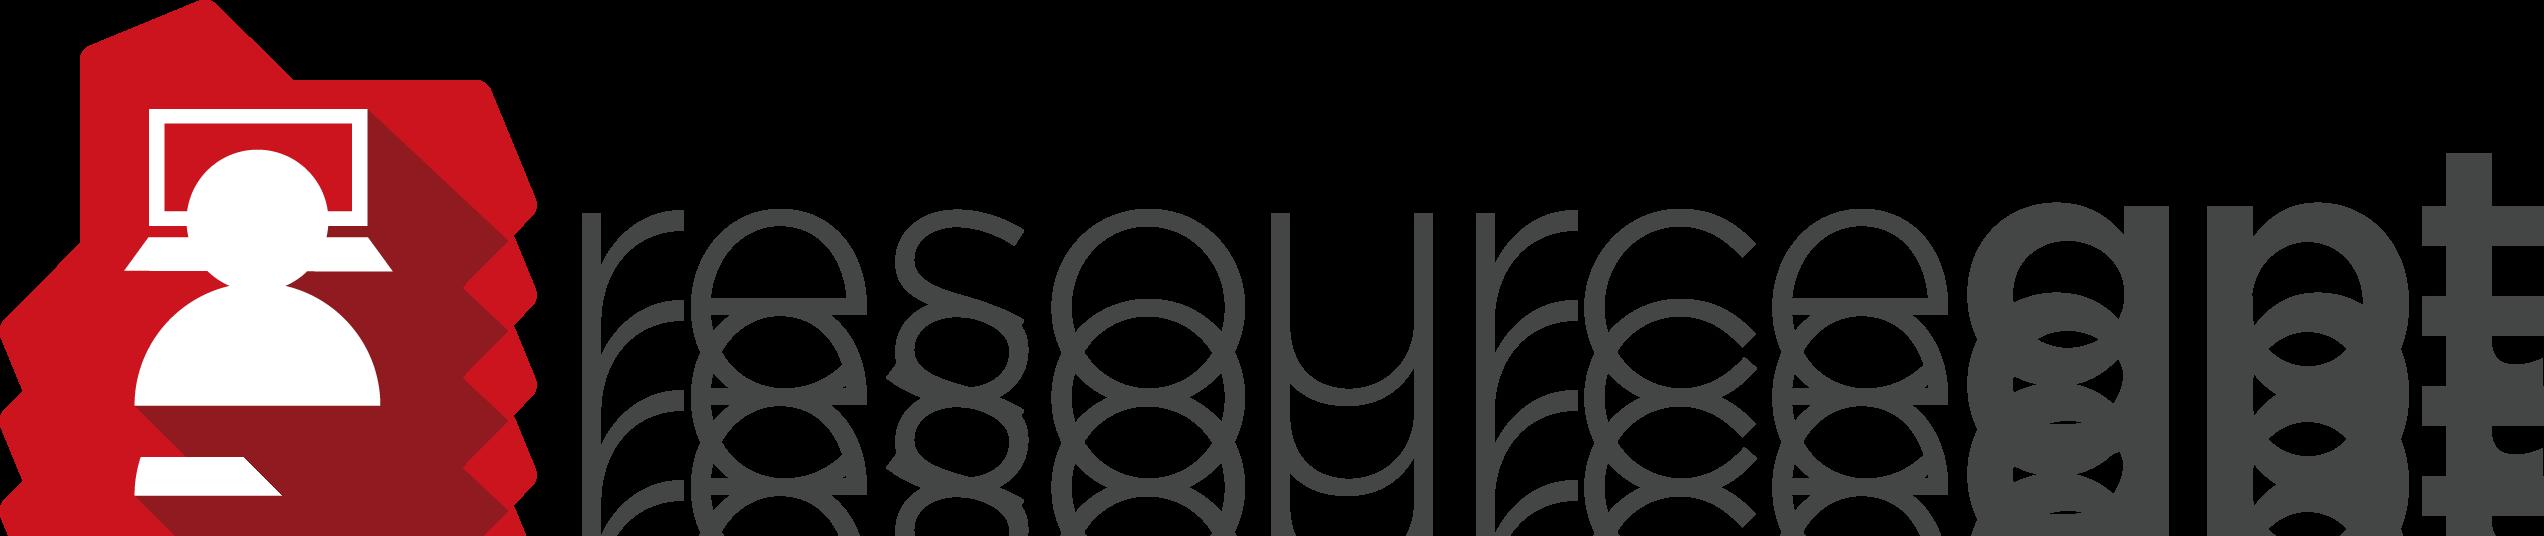 Resource GPT logo